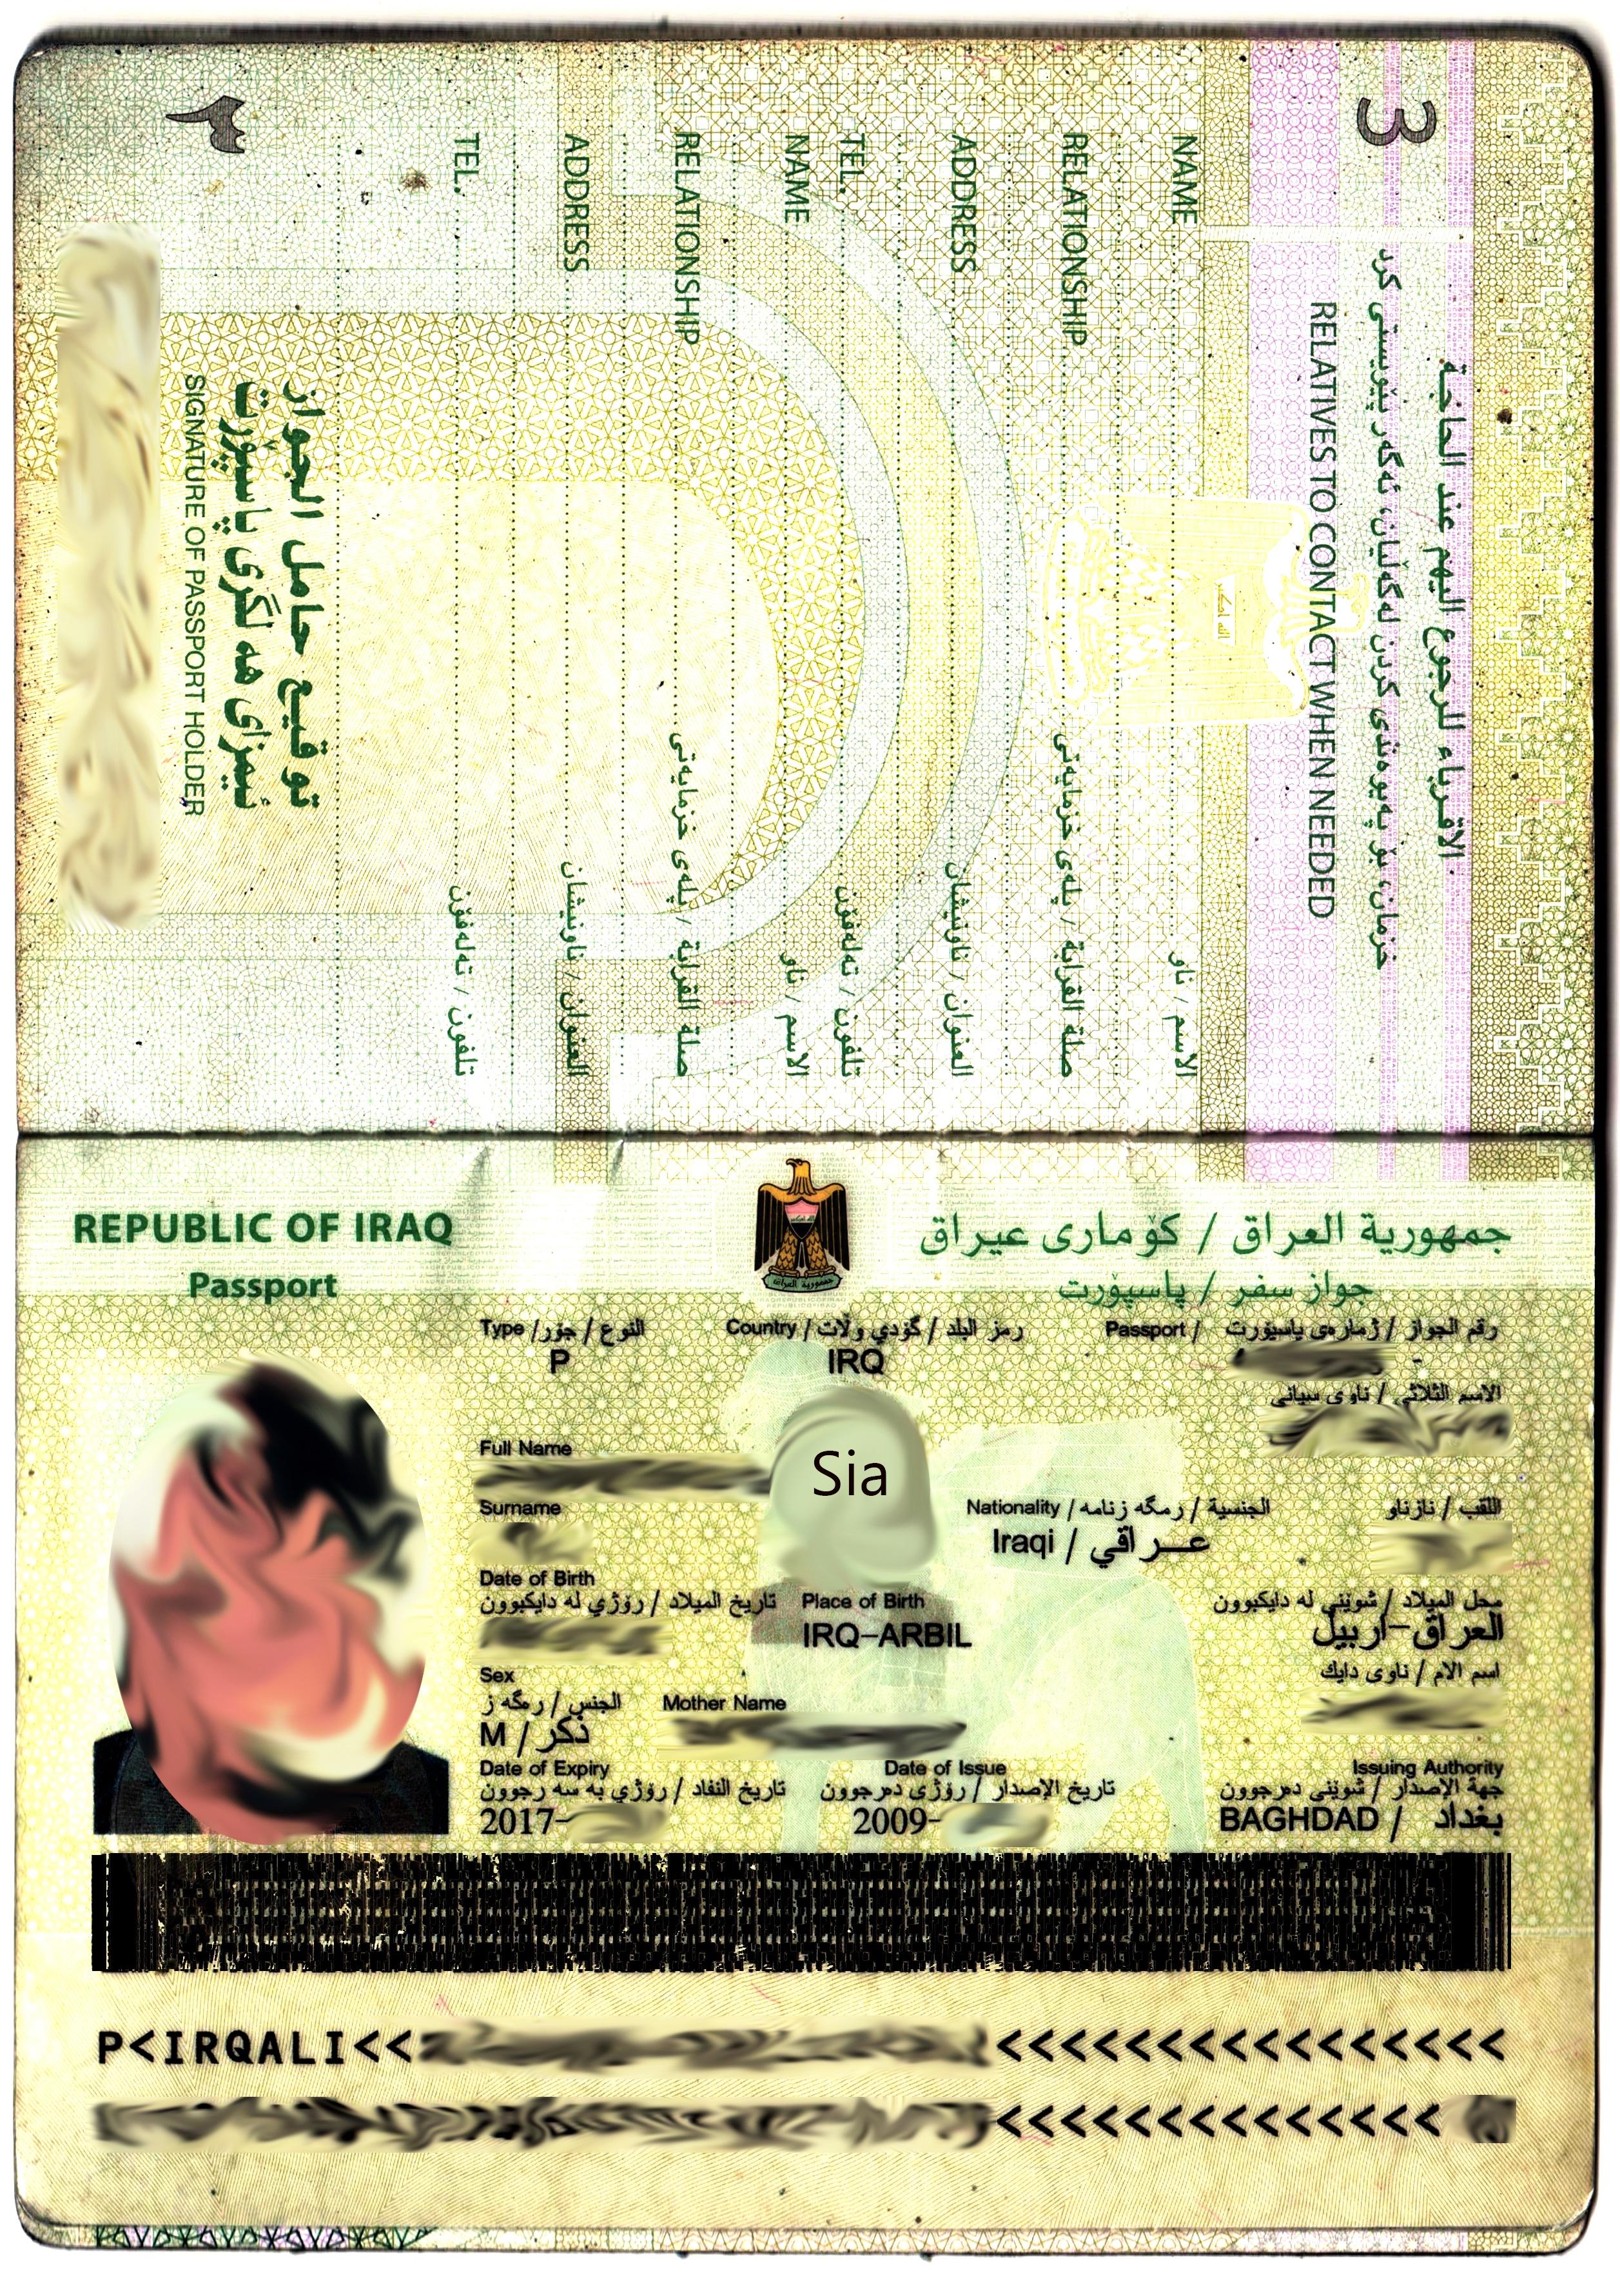 Passport photos for free online